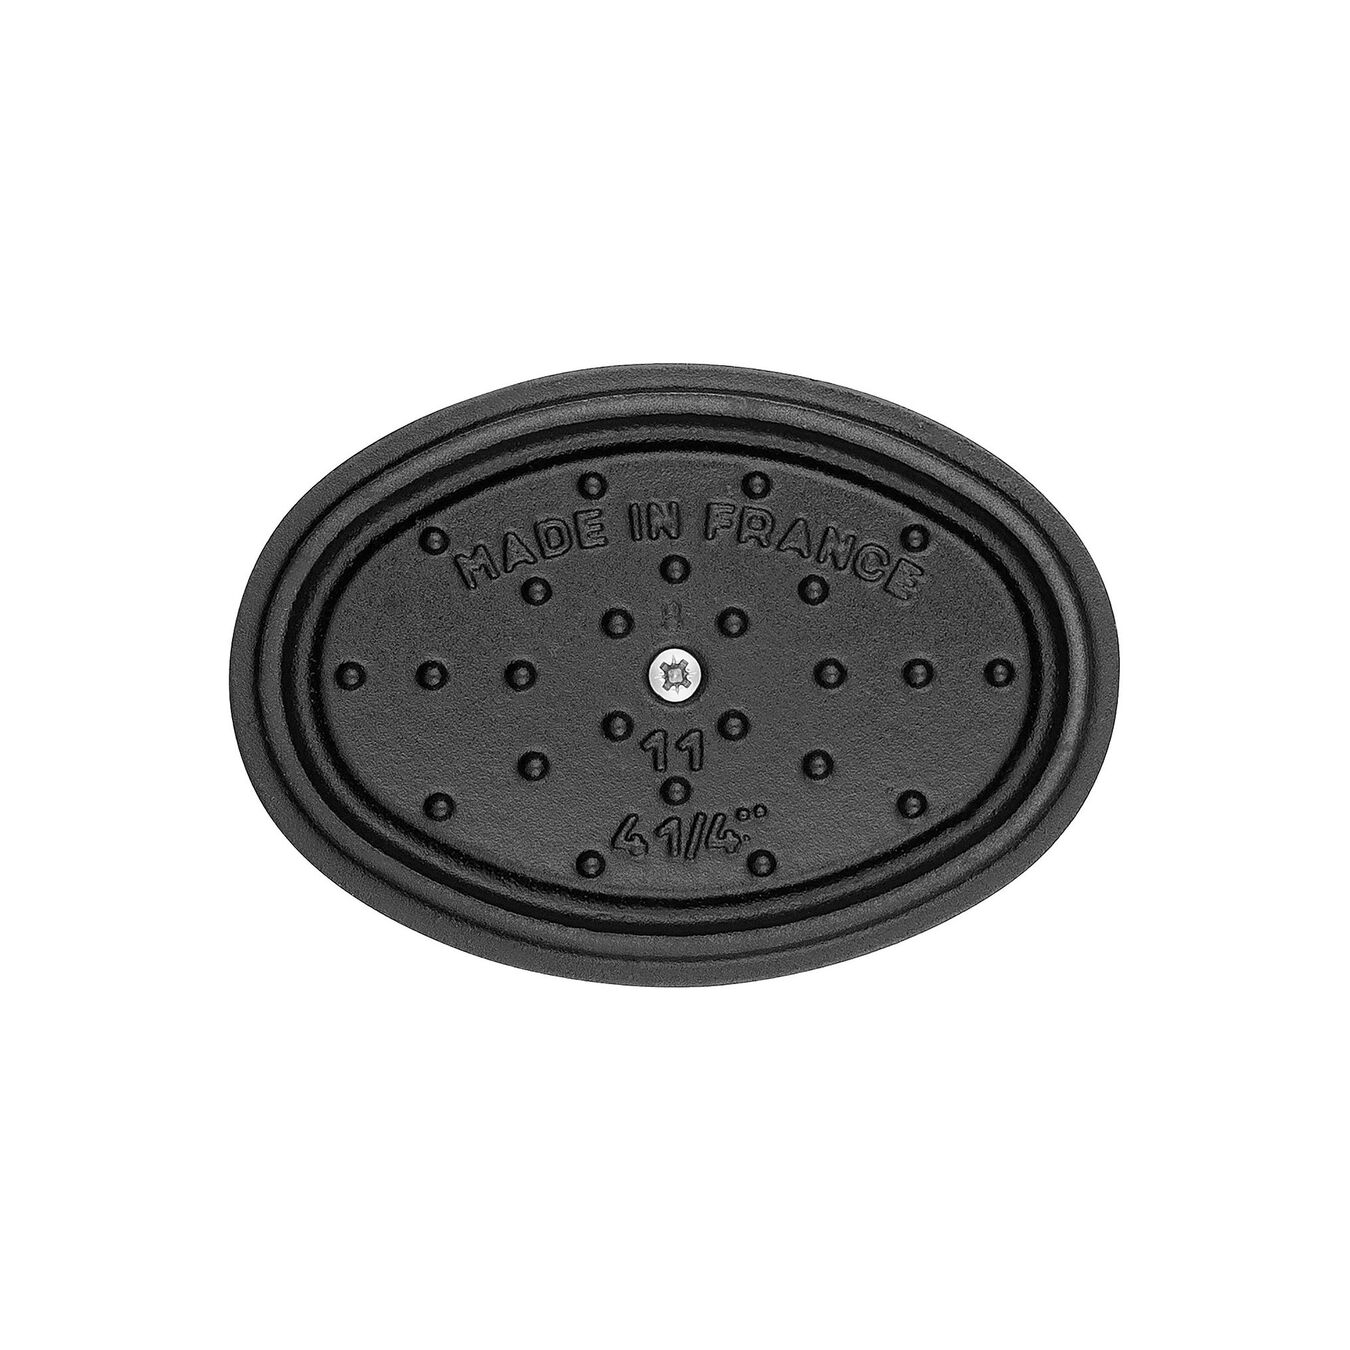 Mini Cocotte 11 cm, oval, Schwarz, Gusseisen,,large 2